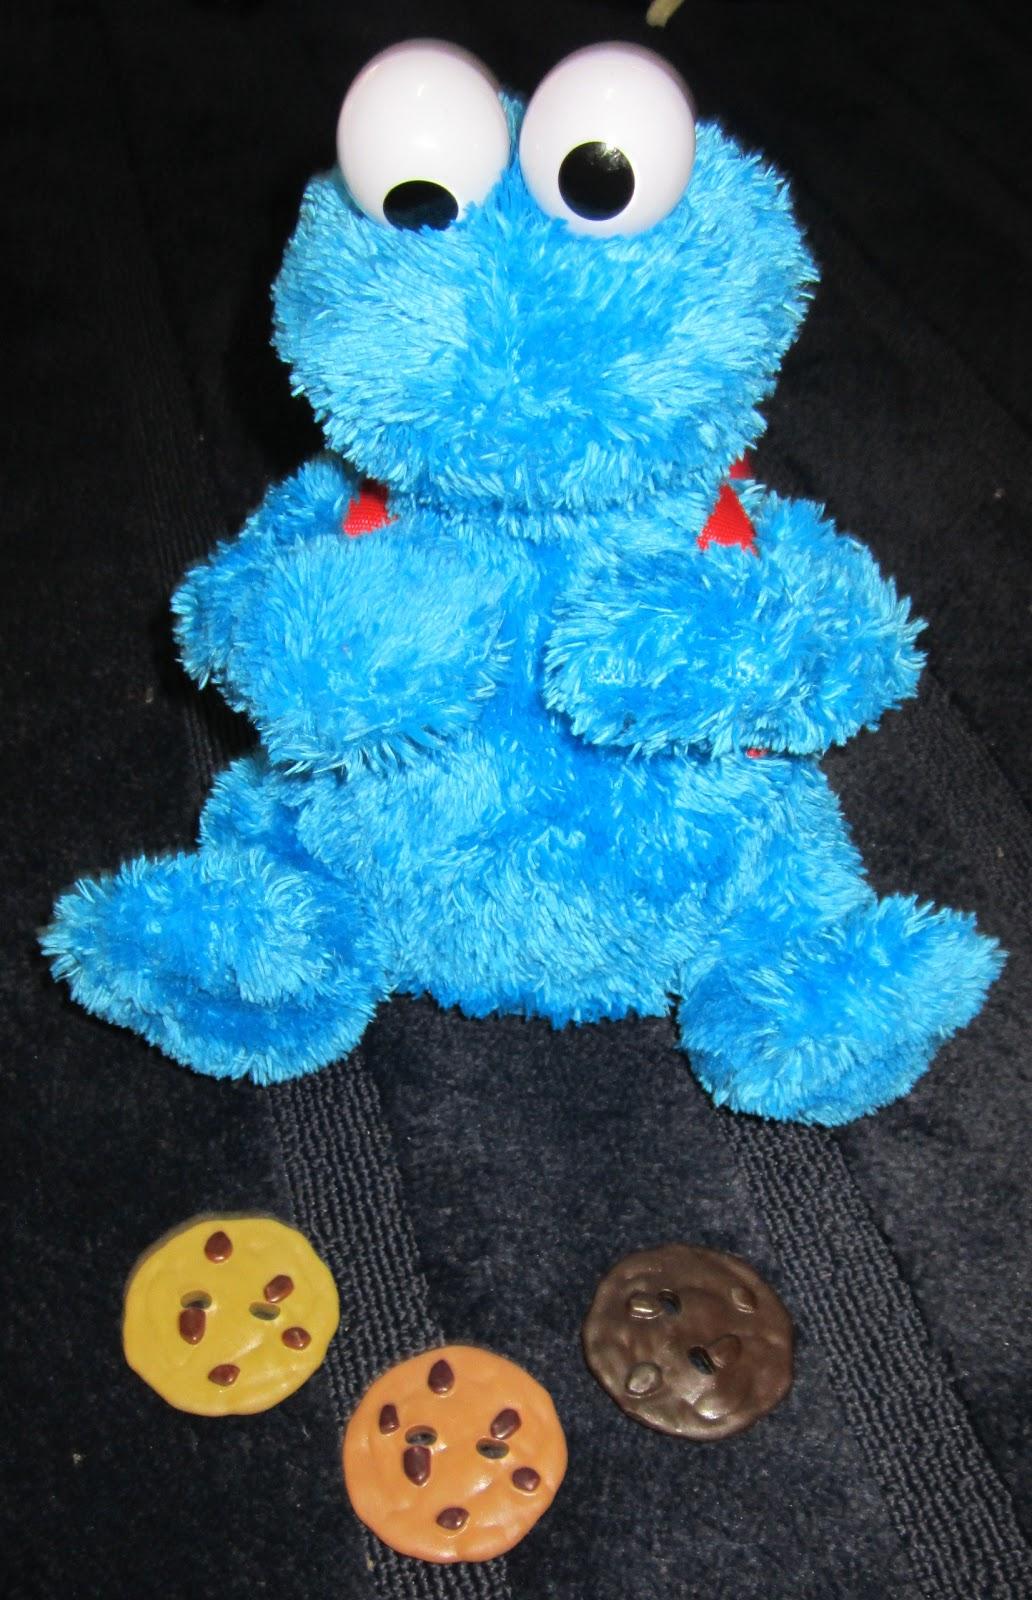 Cookie Monster Gangster Kid 54344 Usbdata